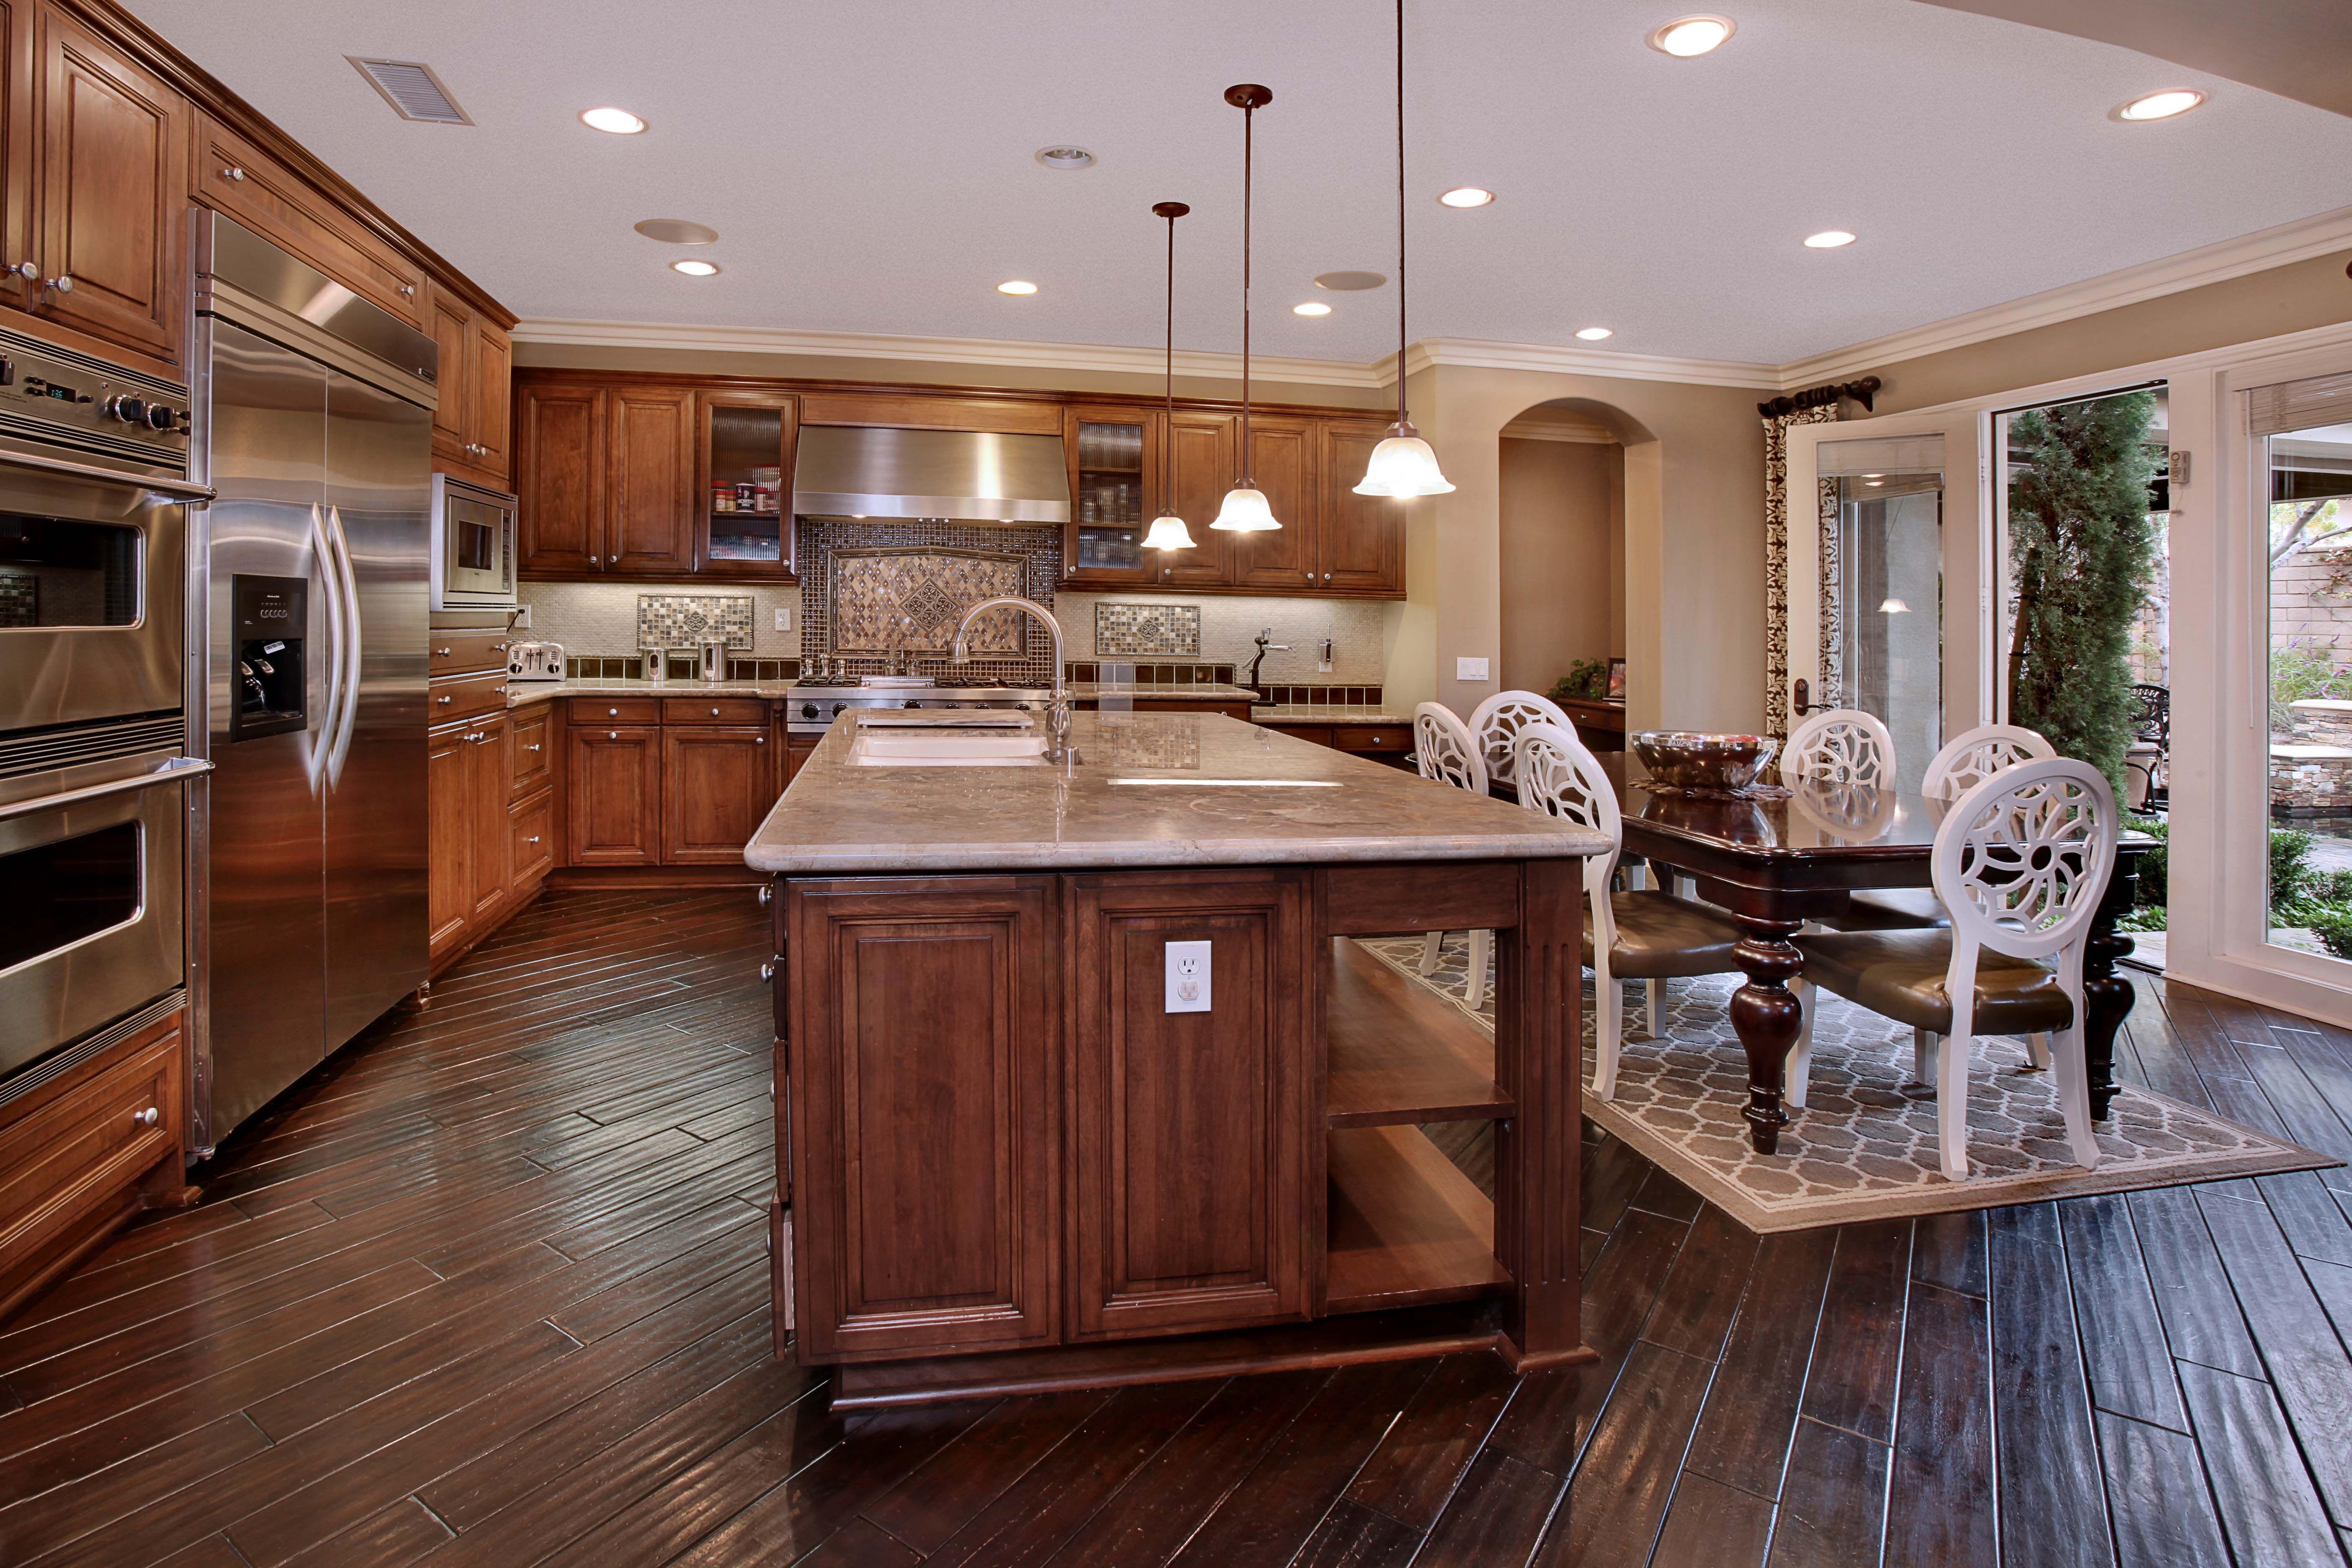 Ambrosia Home Irvine Ca Luxury Portfolio International Member First Team Estates Huge Kitchen Cool Kitchens New Homes